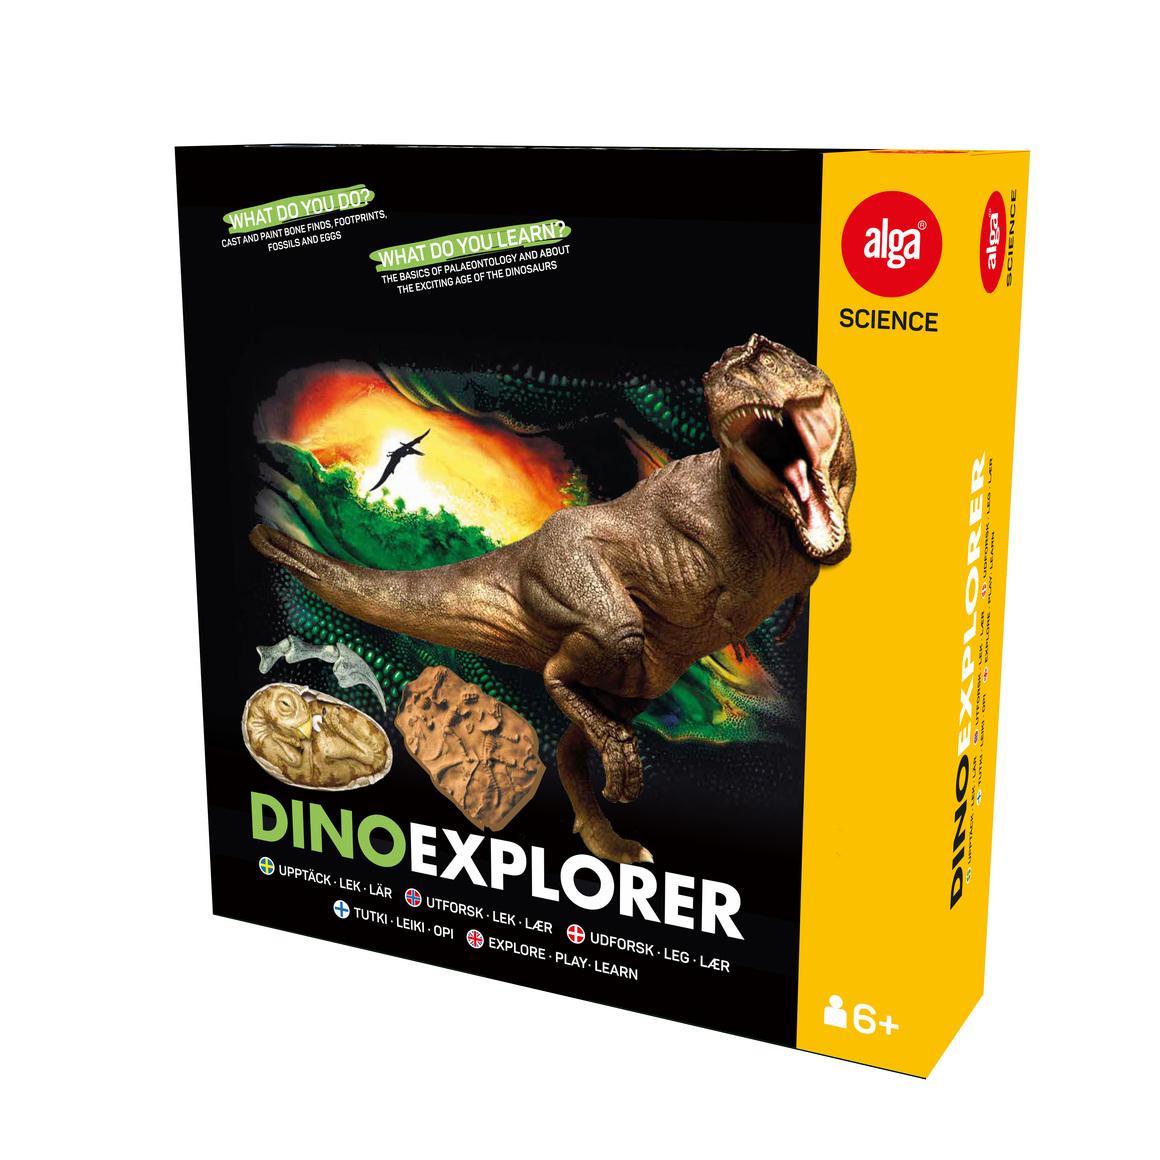 Alga Science Dino explorer Kreativa leksaker hos lekogram.se